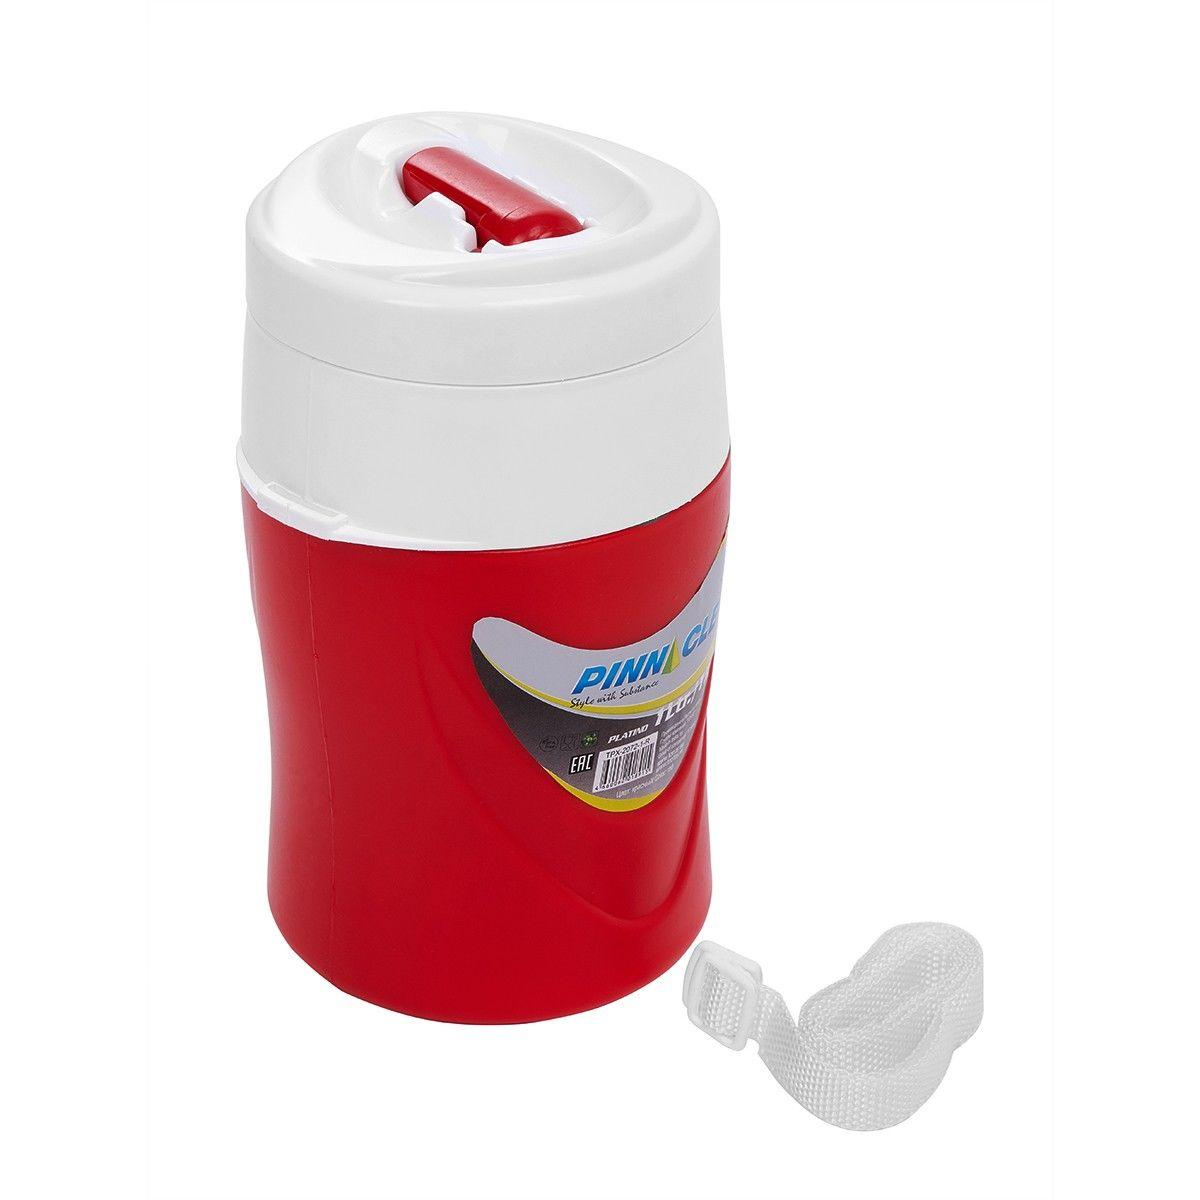 Изотерм. контейнер для жидкости platino 1л красный tpx-2072-1-r pinnacle tr-212768 - фото 2